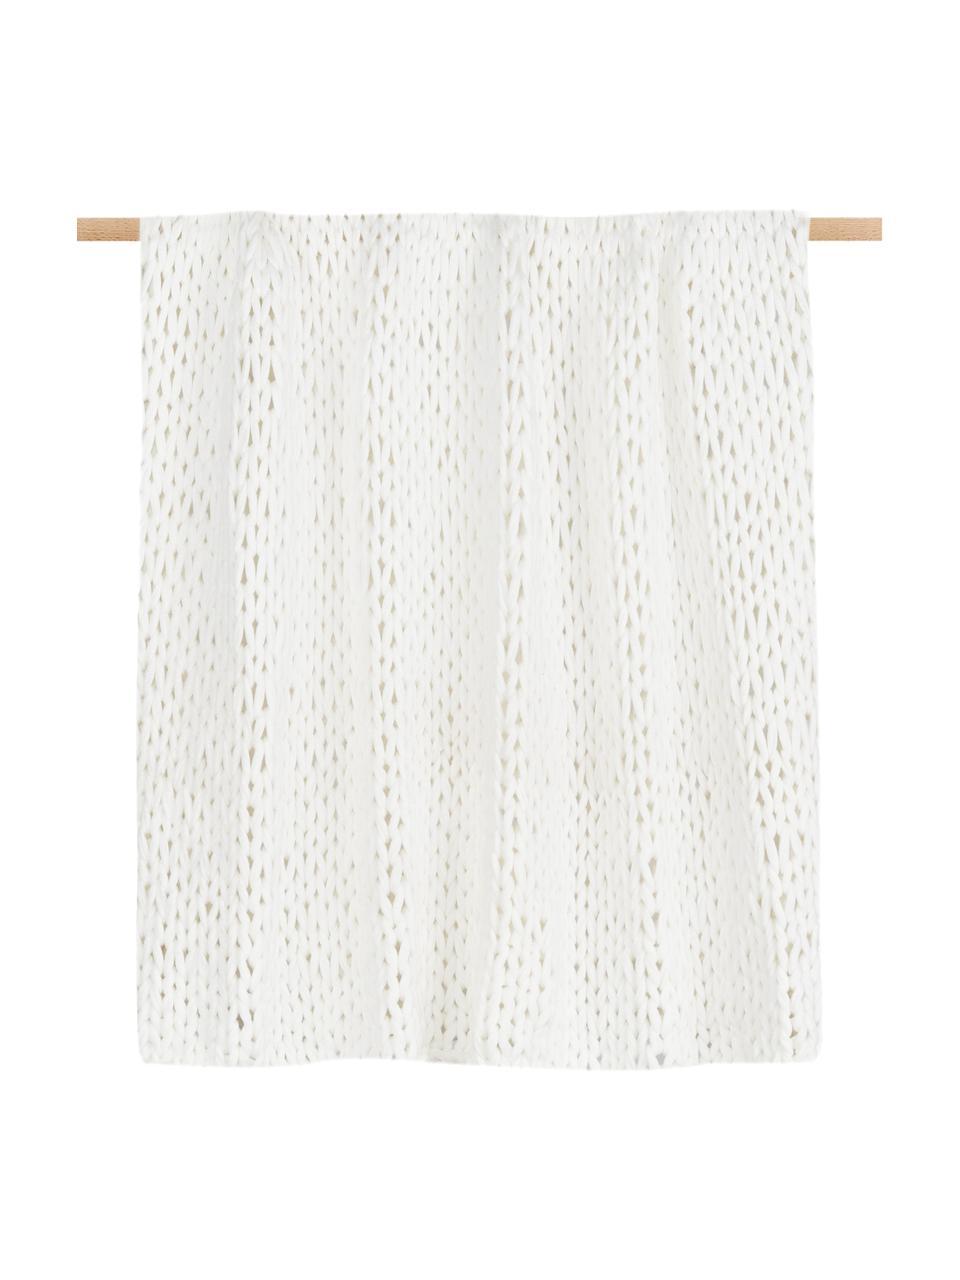 Plaid a maglia Adyna, 100% acrilico, Bianco, 150 x 200 cm